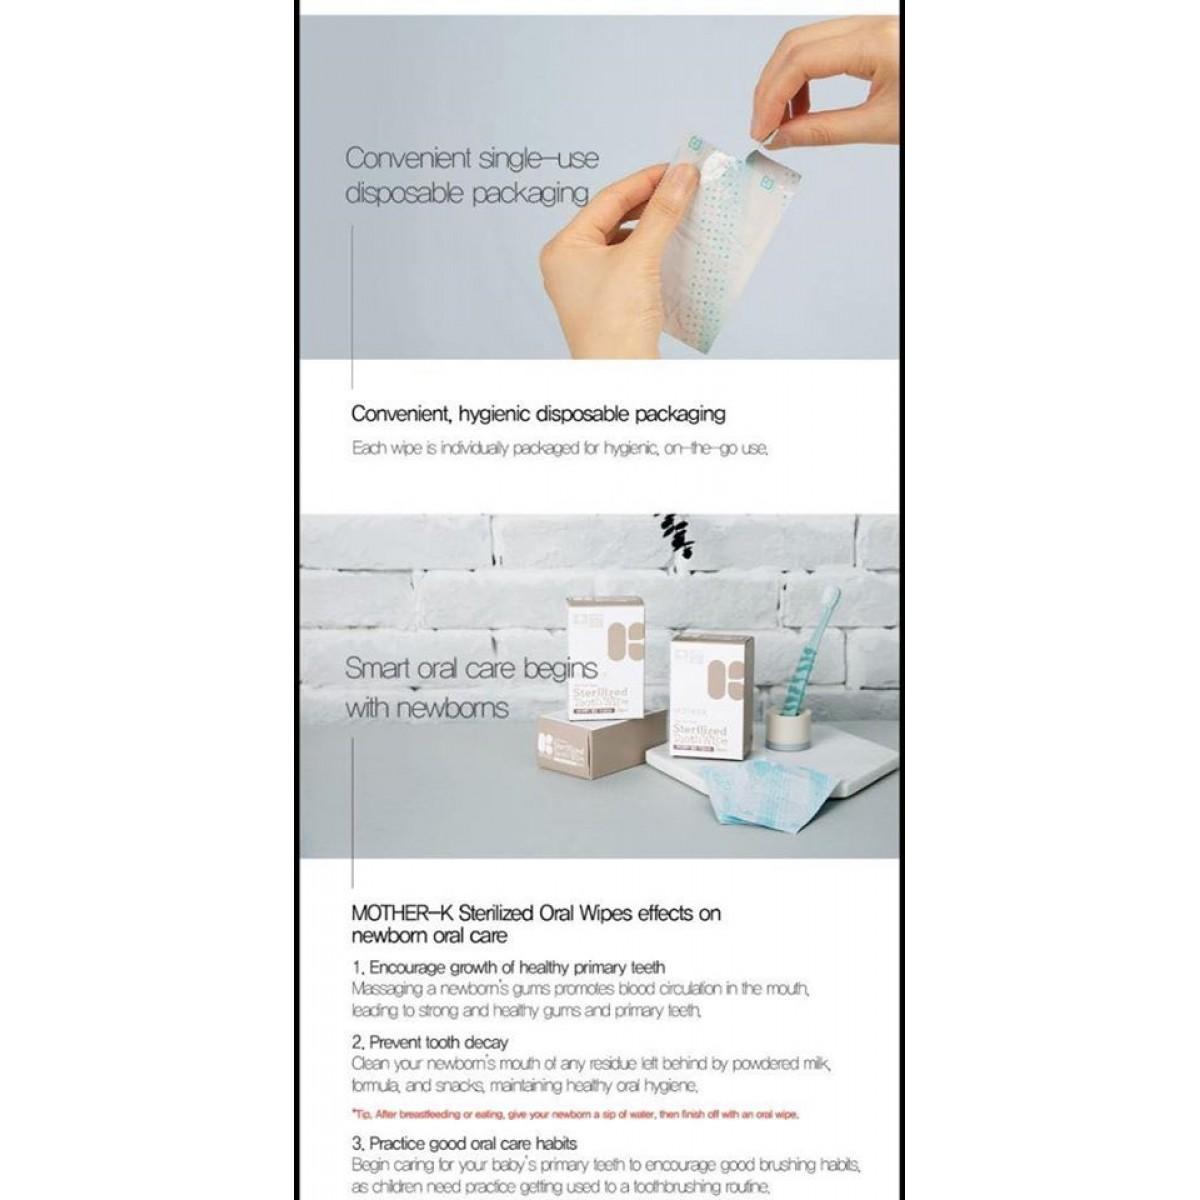 Mother-K Sterilized Dental and Gum Wipes 30pcs